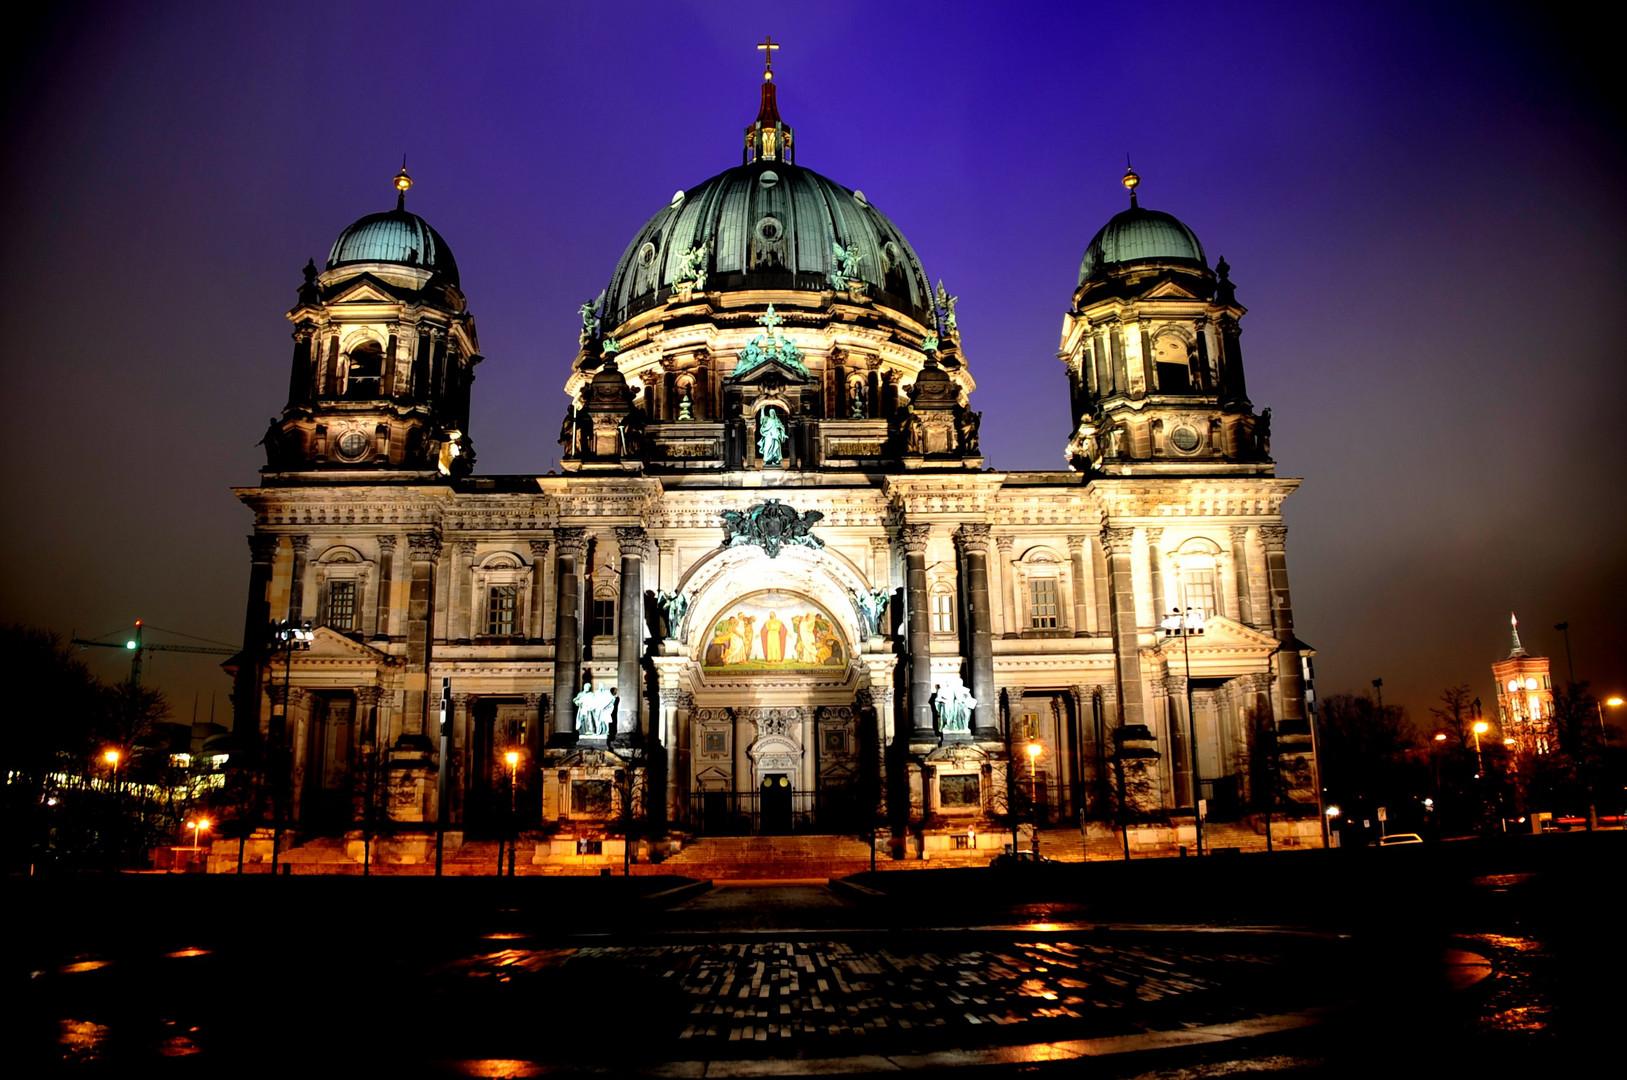 Fe de noche, Berlin